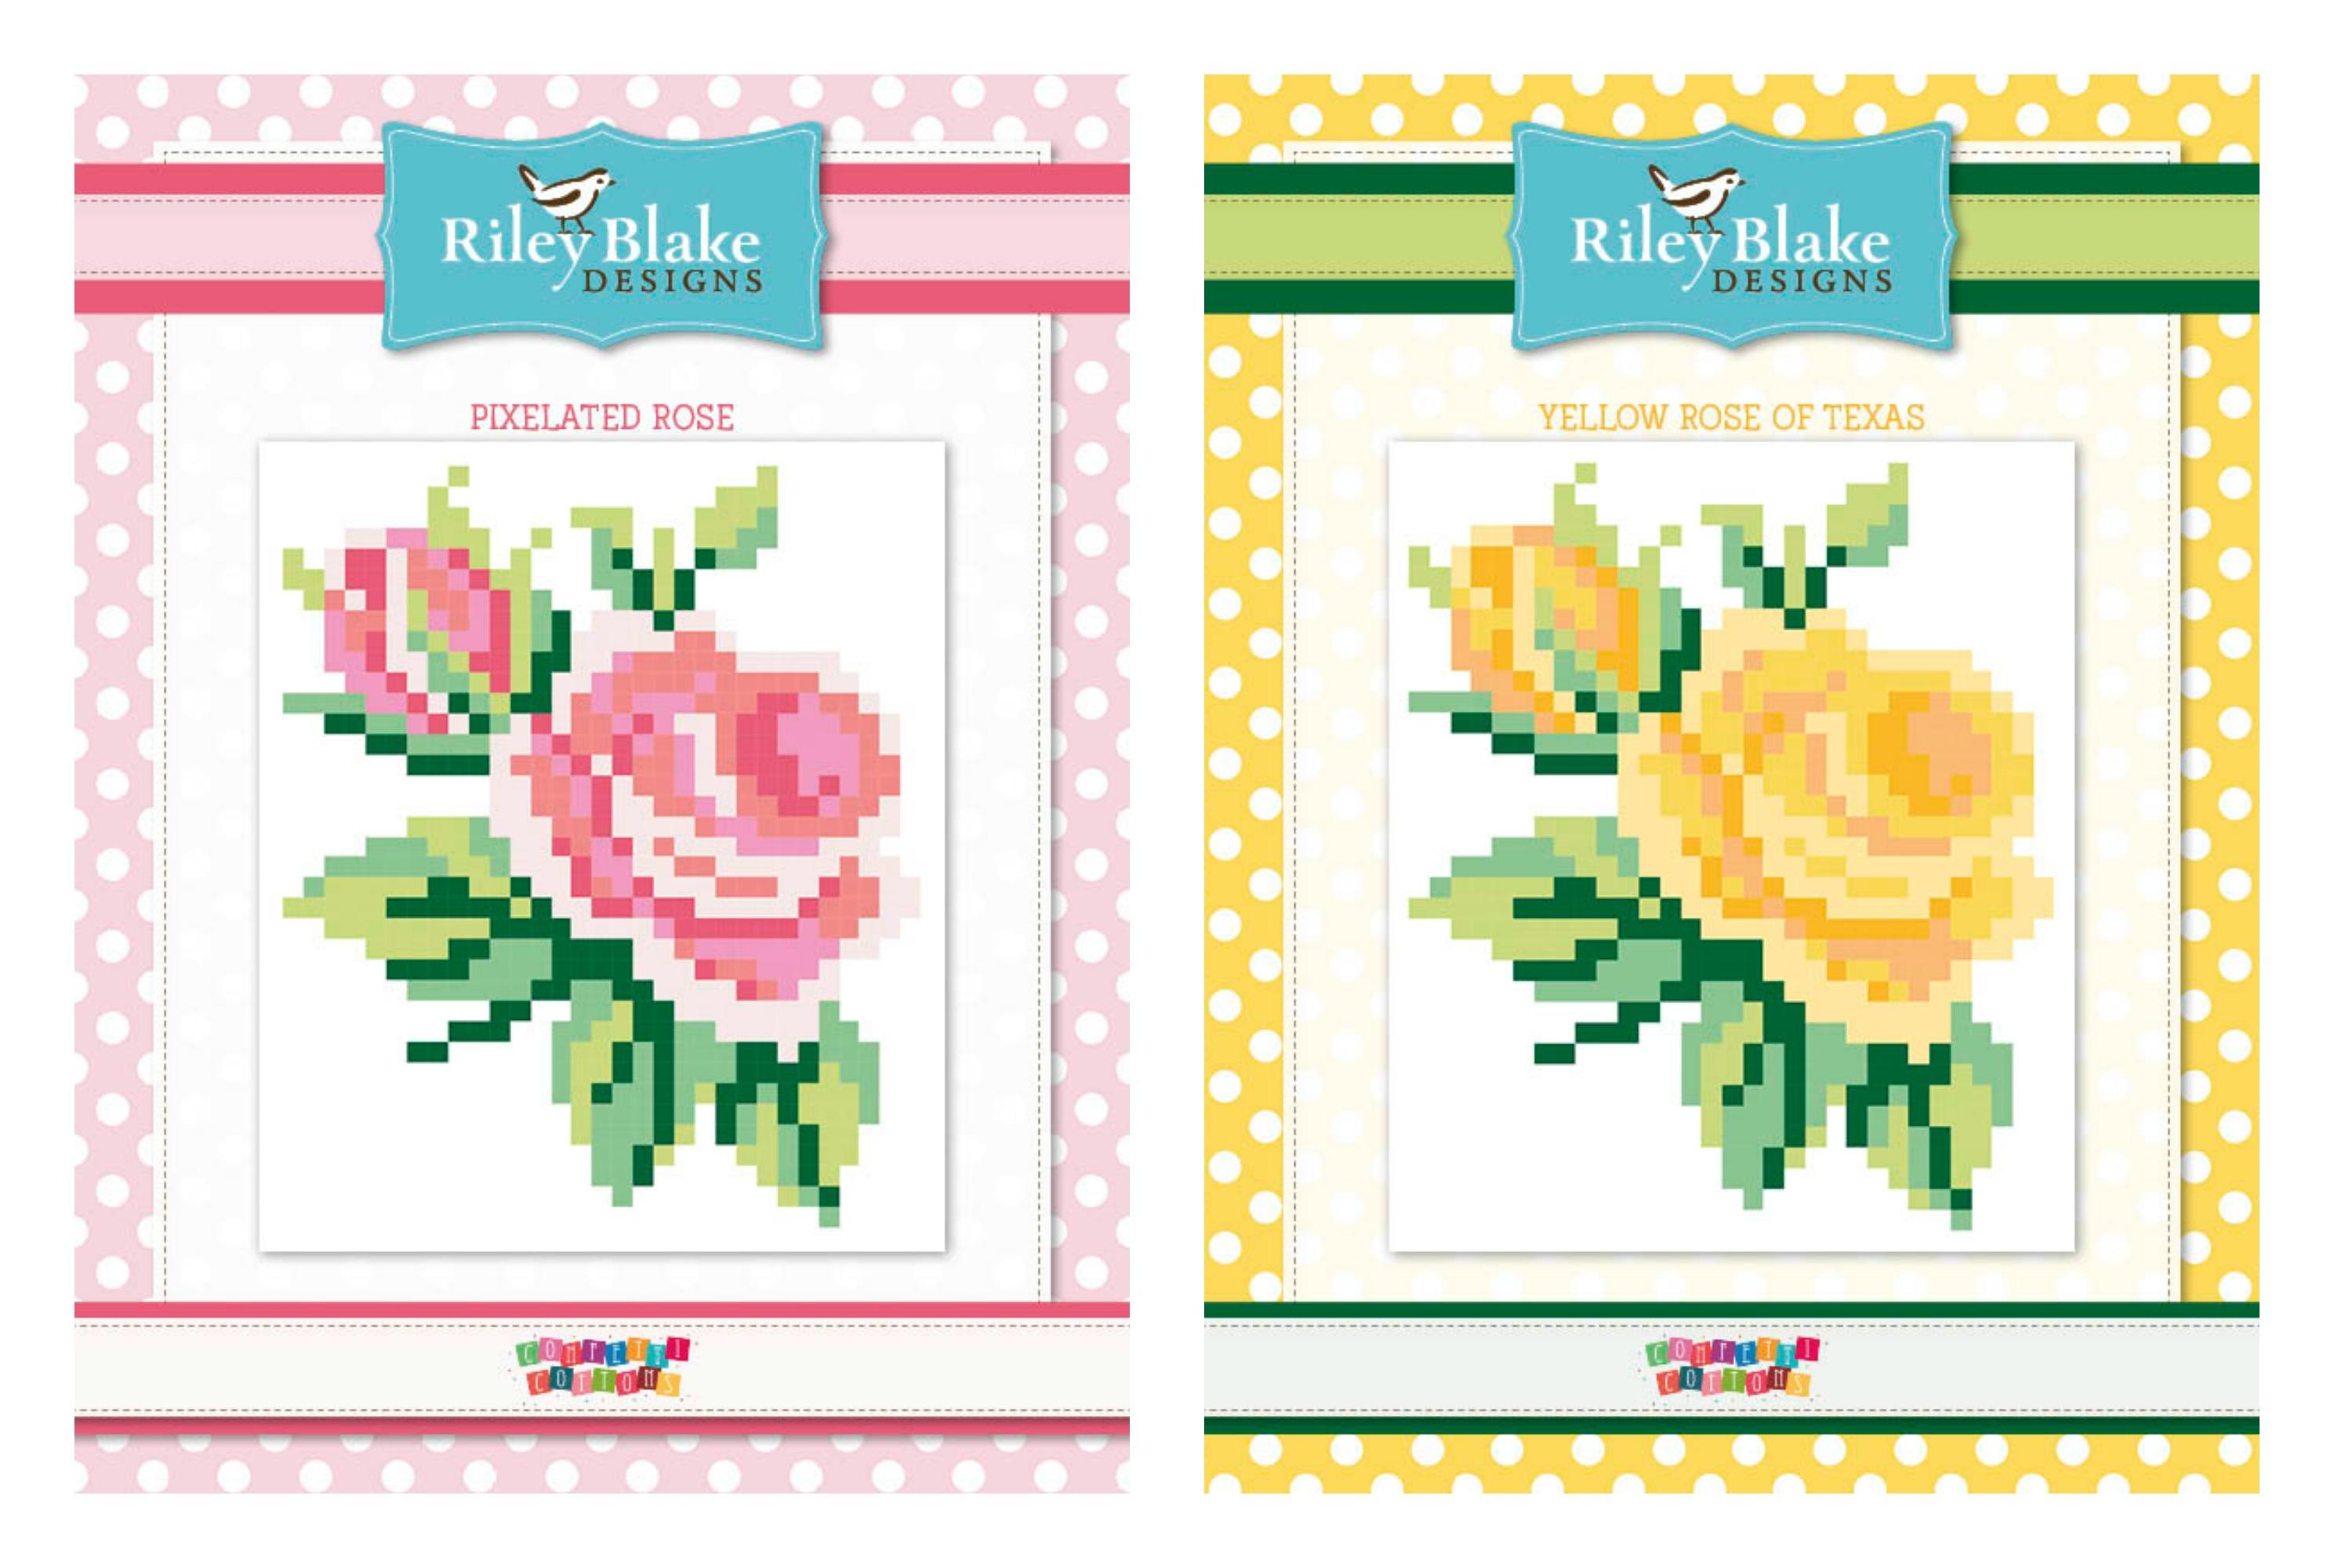 Rose Pixel Quilt Patterns by Riley Blake